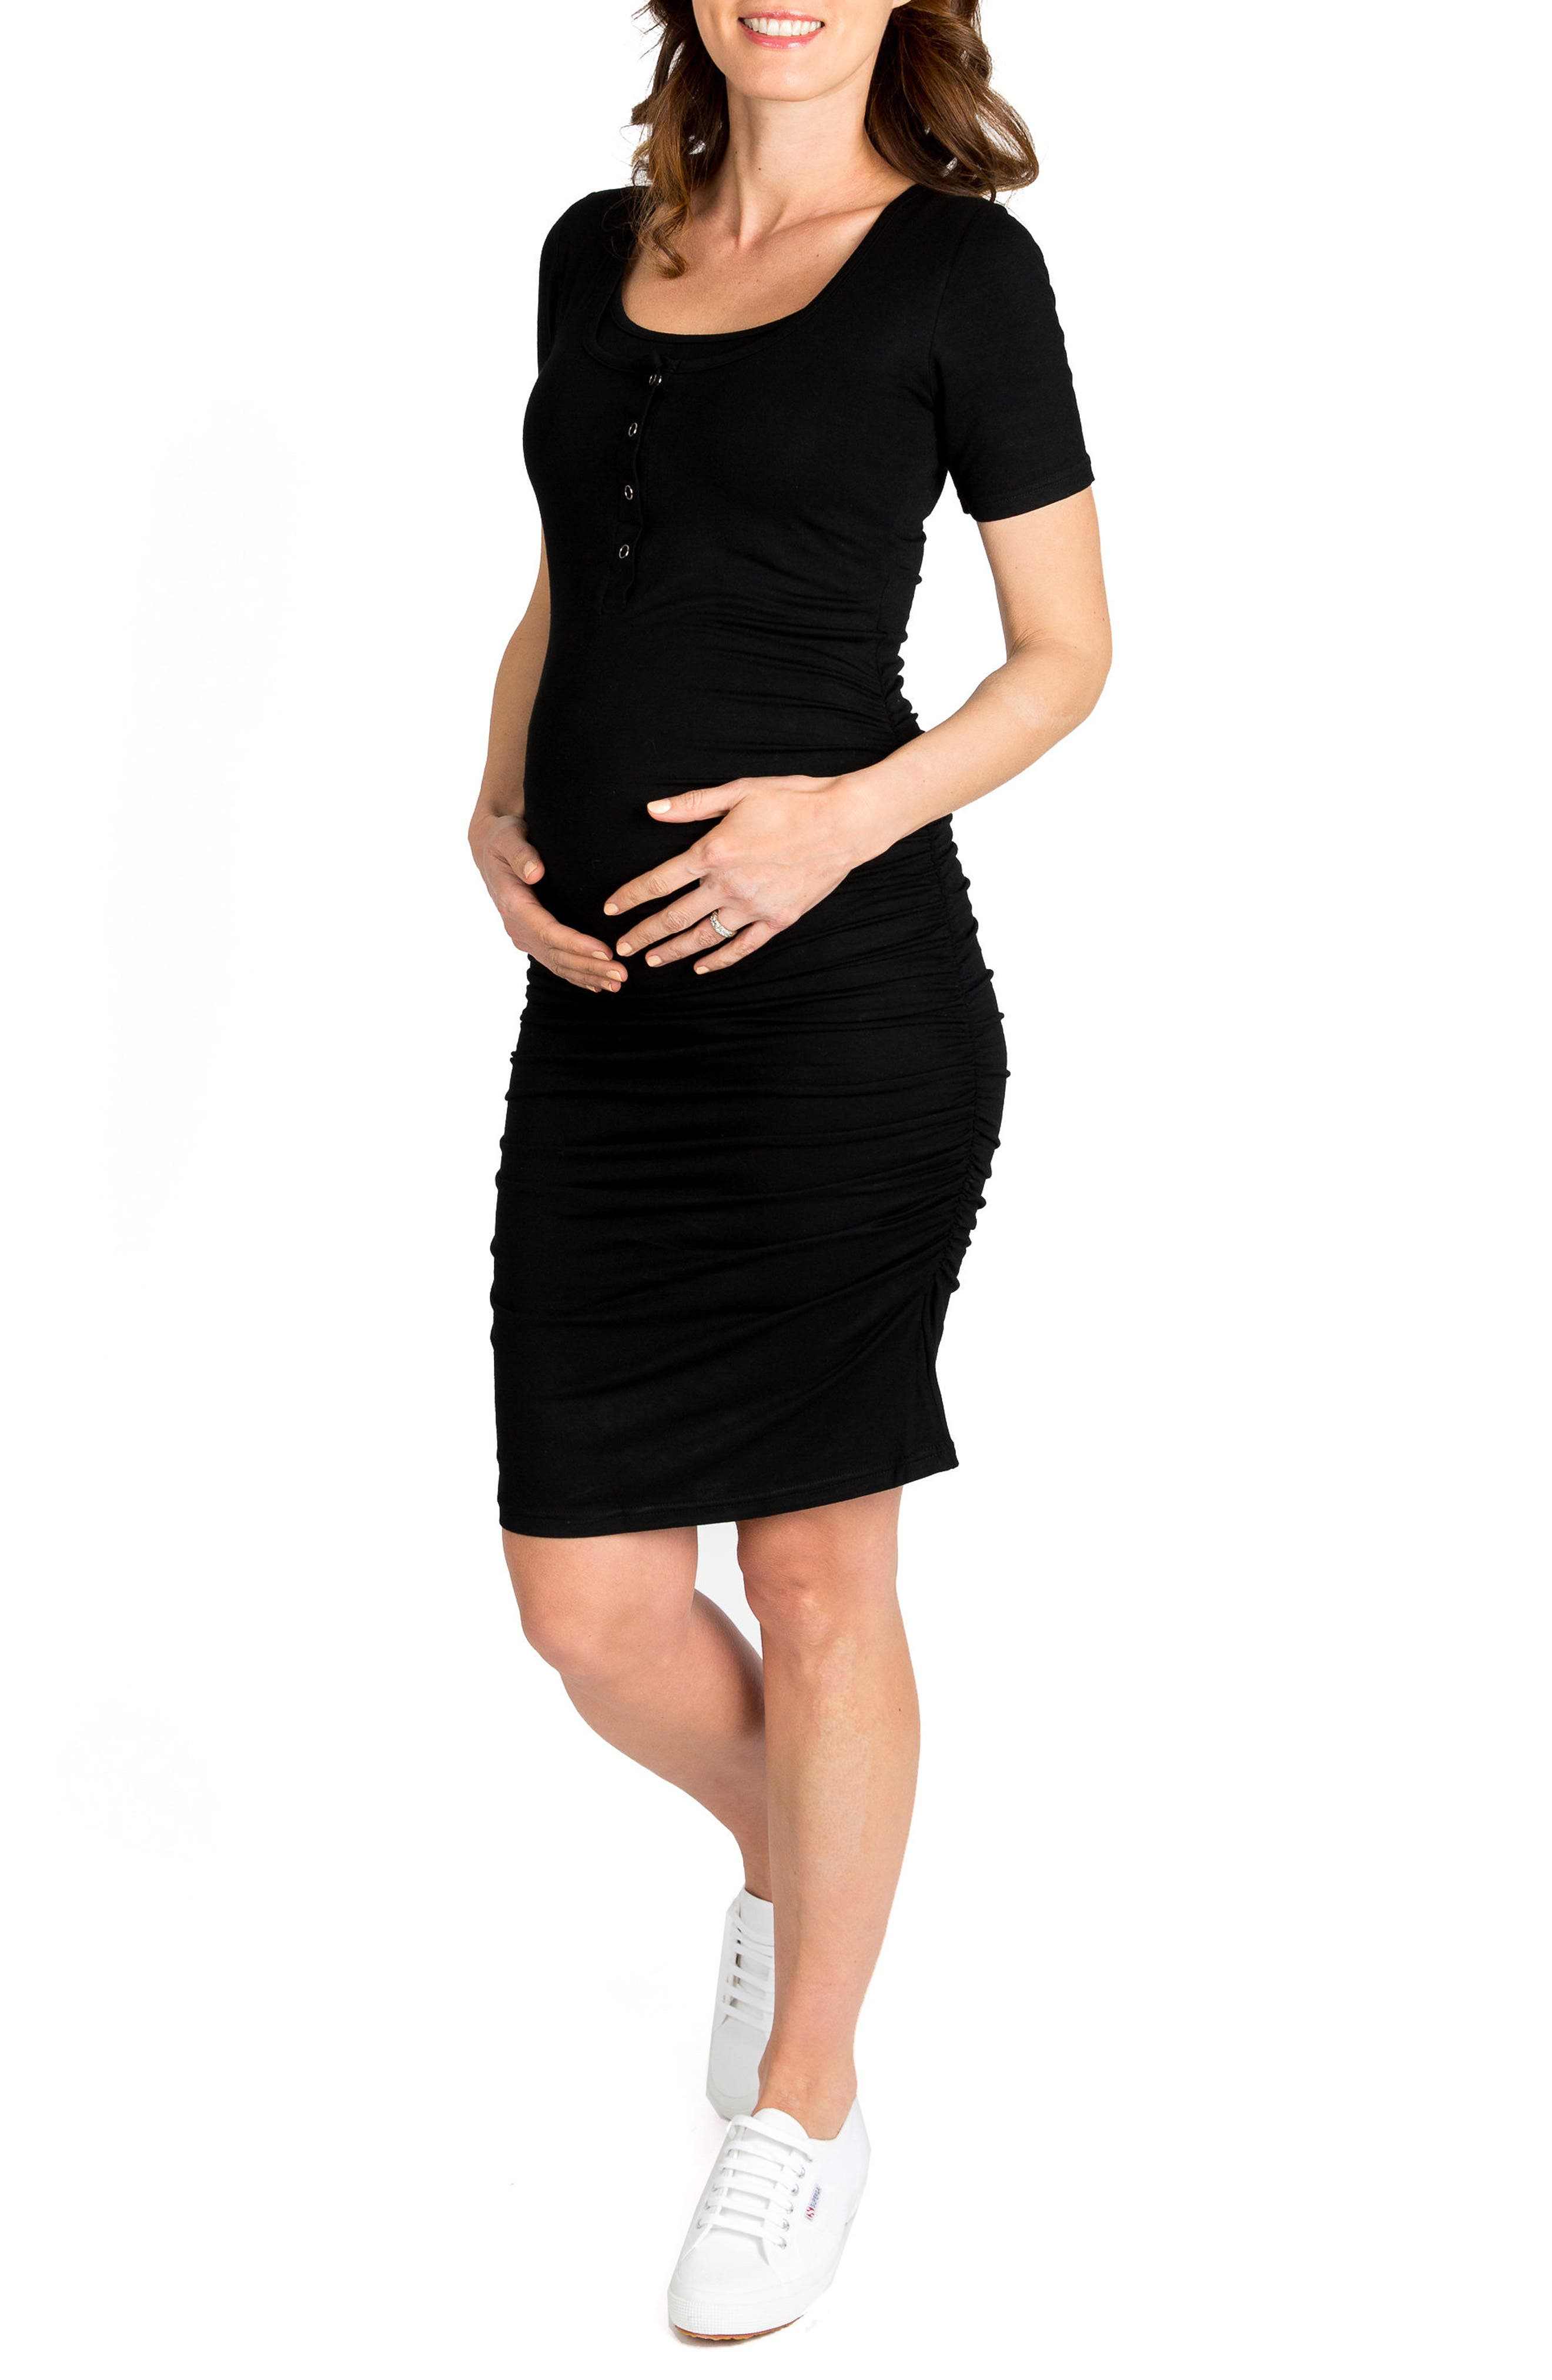 Nom Maternity Snap Maternity/nursing Shirtdress